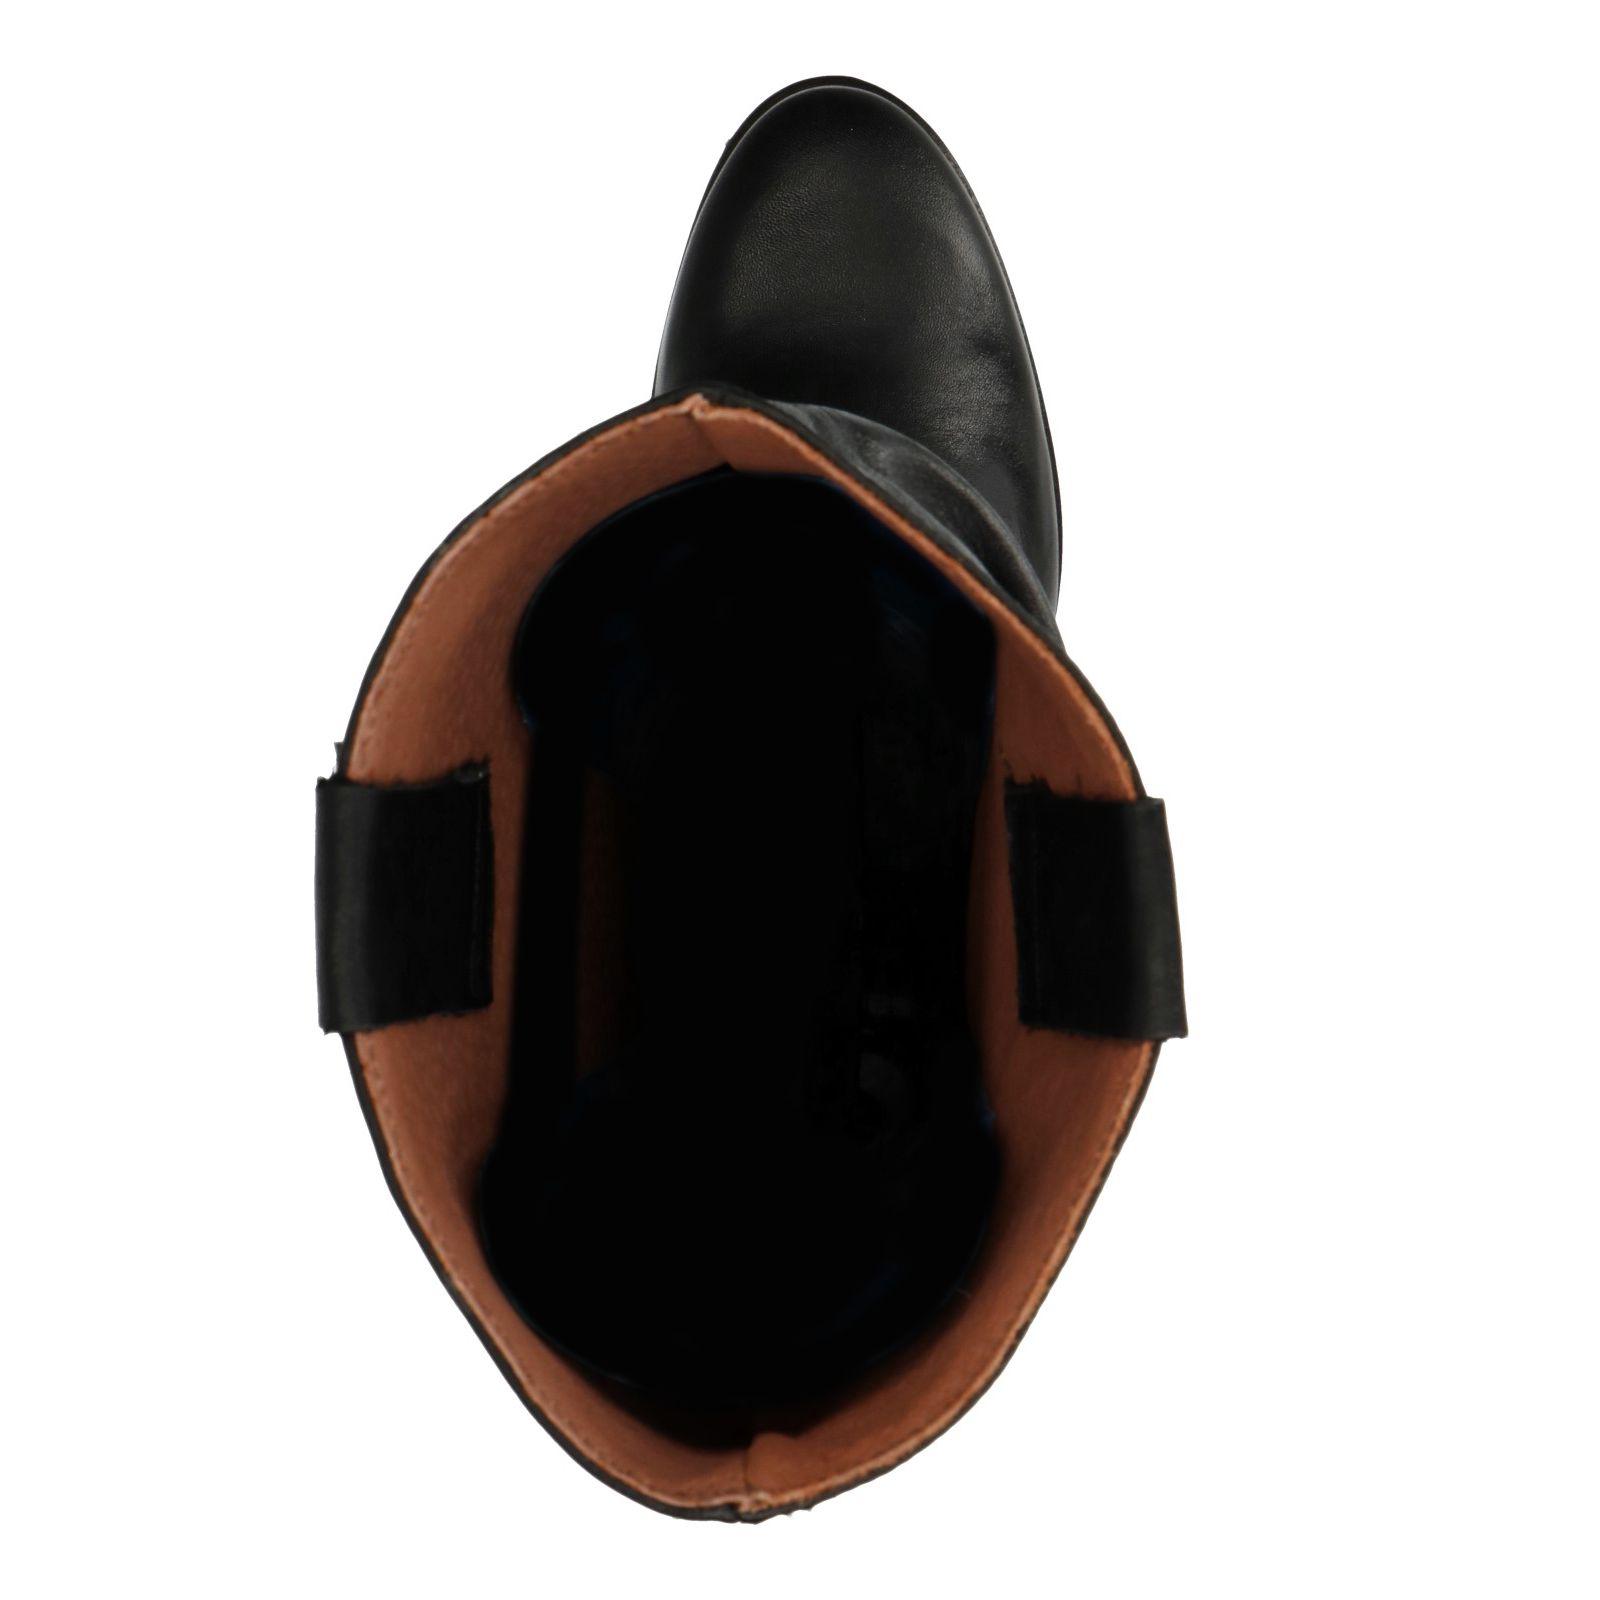 Bottes plissées noir Bottes plissées Bottes cuir plissées Sacha cuir Sacha Sacha noir cuir OPZiTkXu